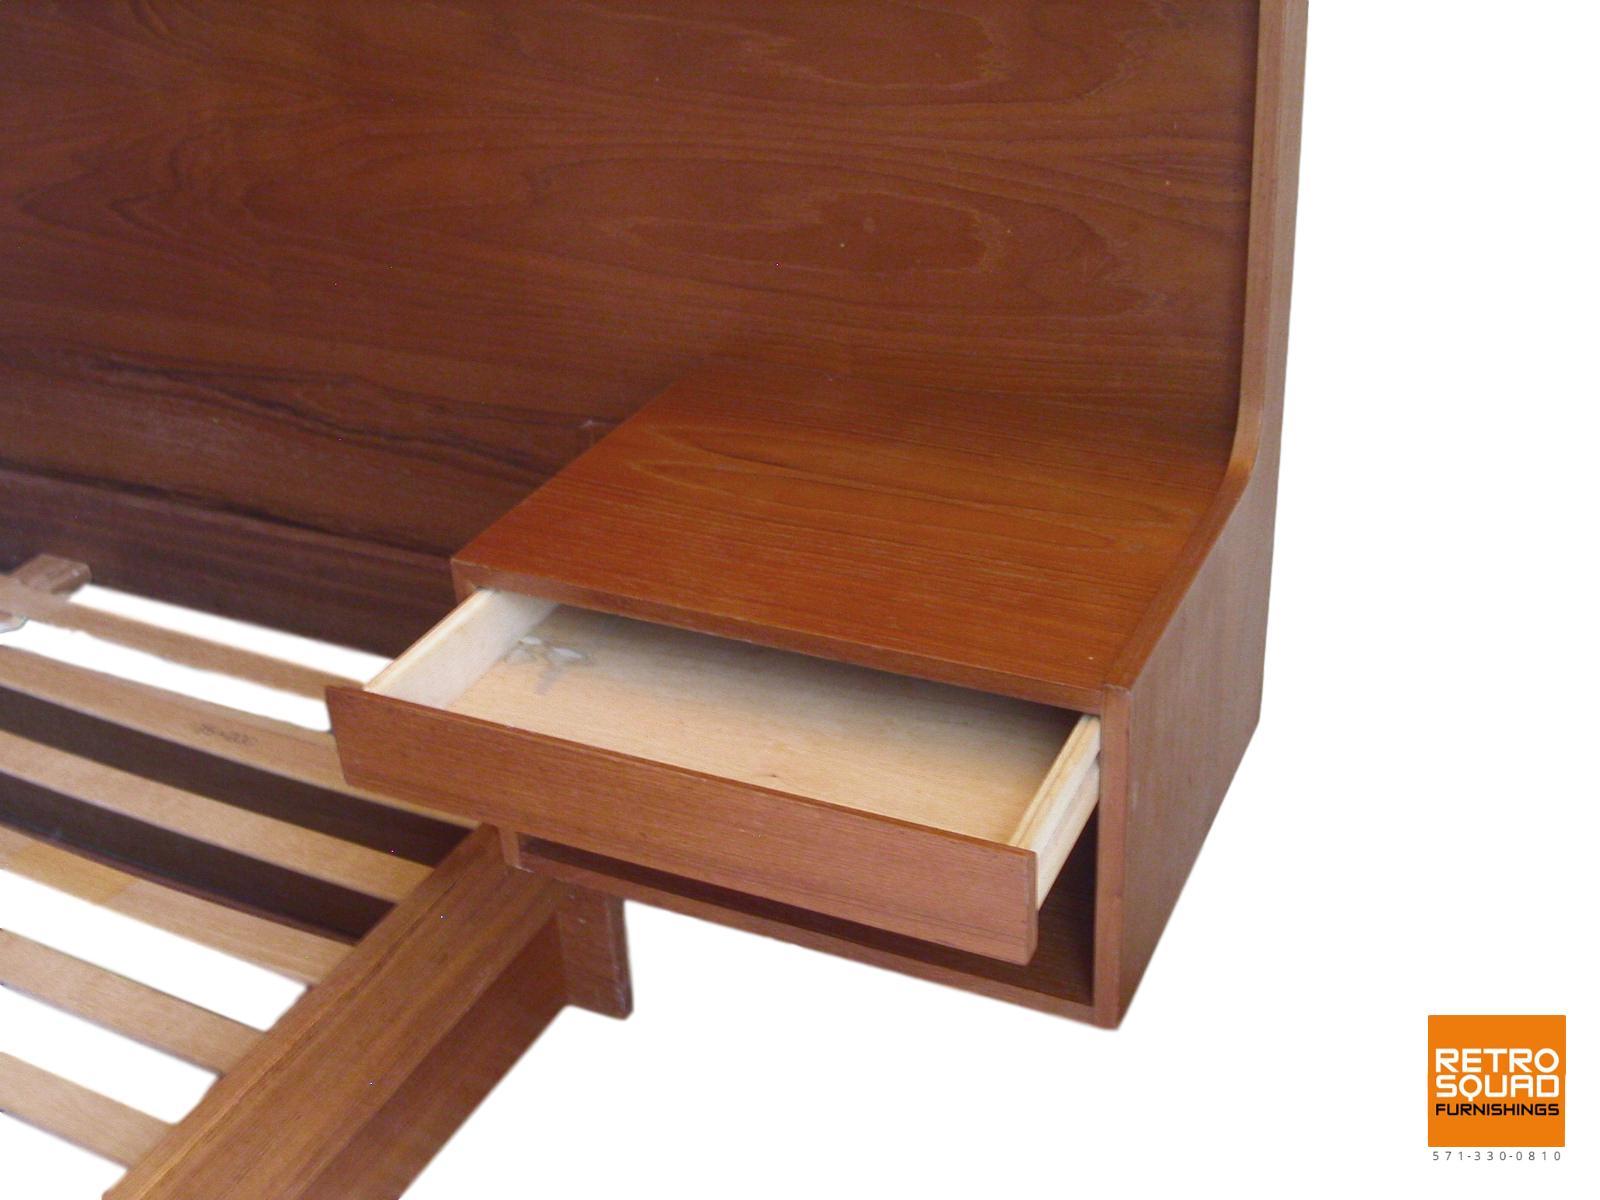 Danish-Modern-QUEEN-Size-Teak-Platform-Bed-With-Nightstands-Lighted-Headboard-from-Sannemanns-of-Denmark-09